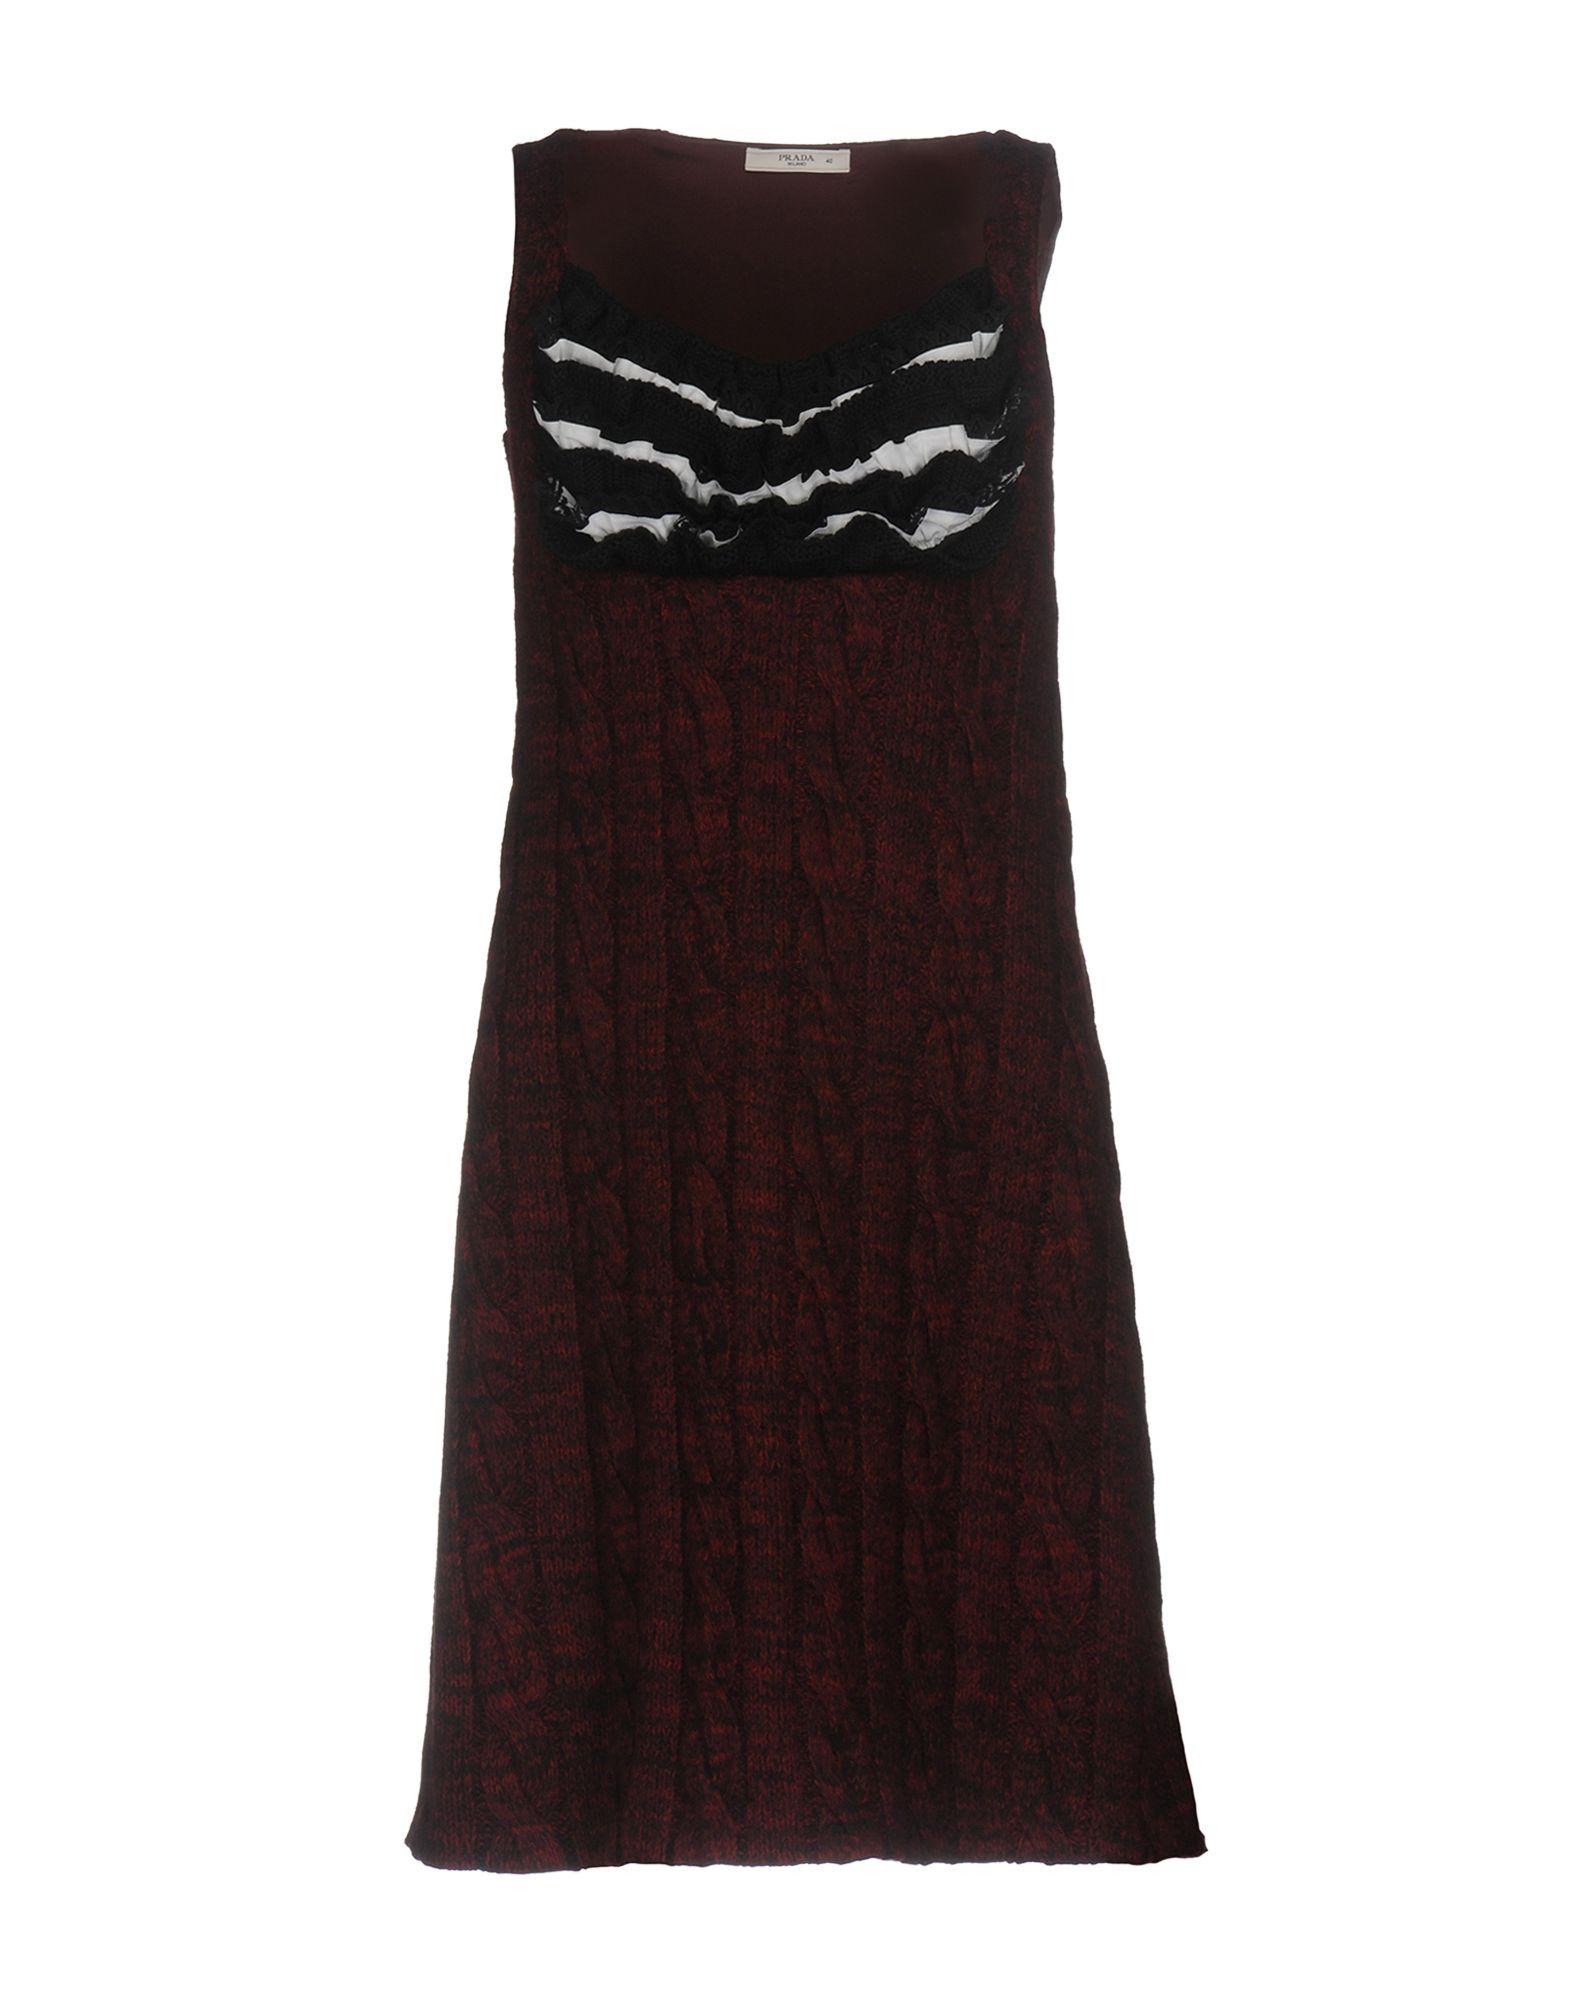 PRADA Damen Kurzes Kleid Farbe Bordeaux Größe 3 - broschei